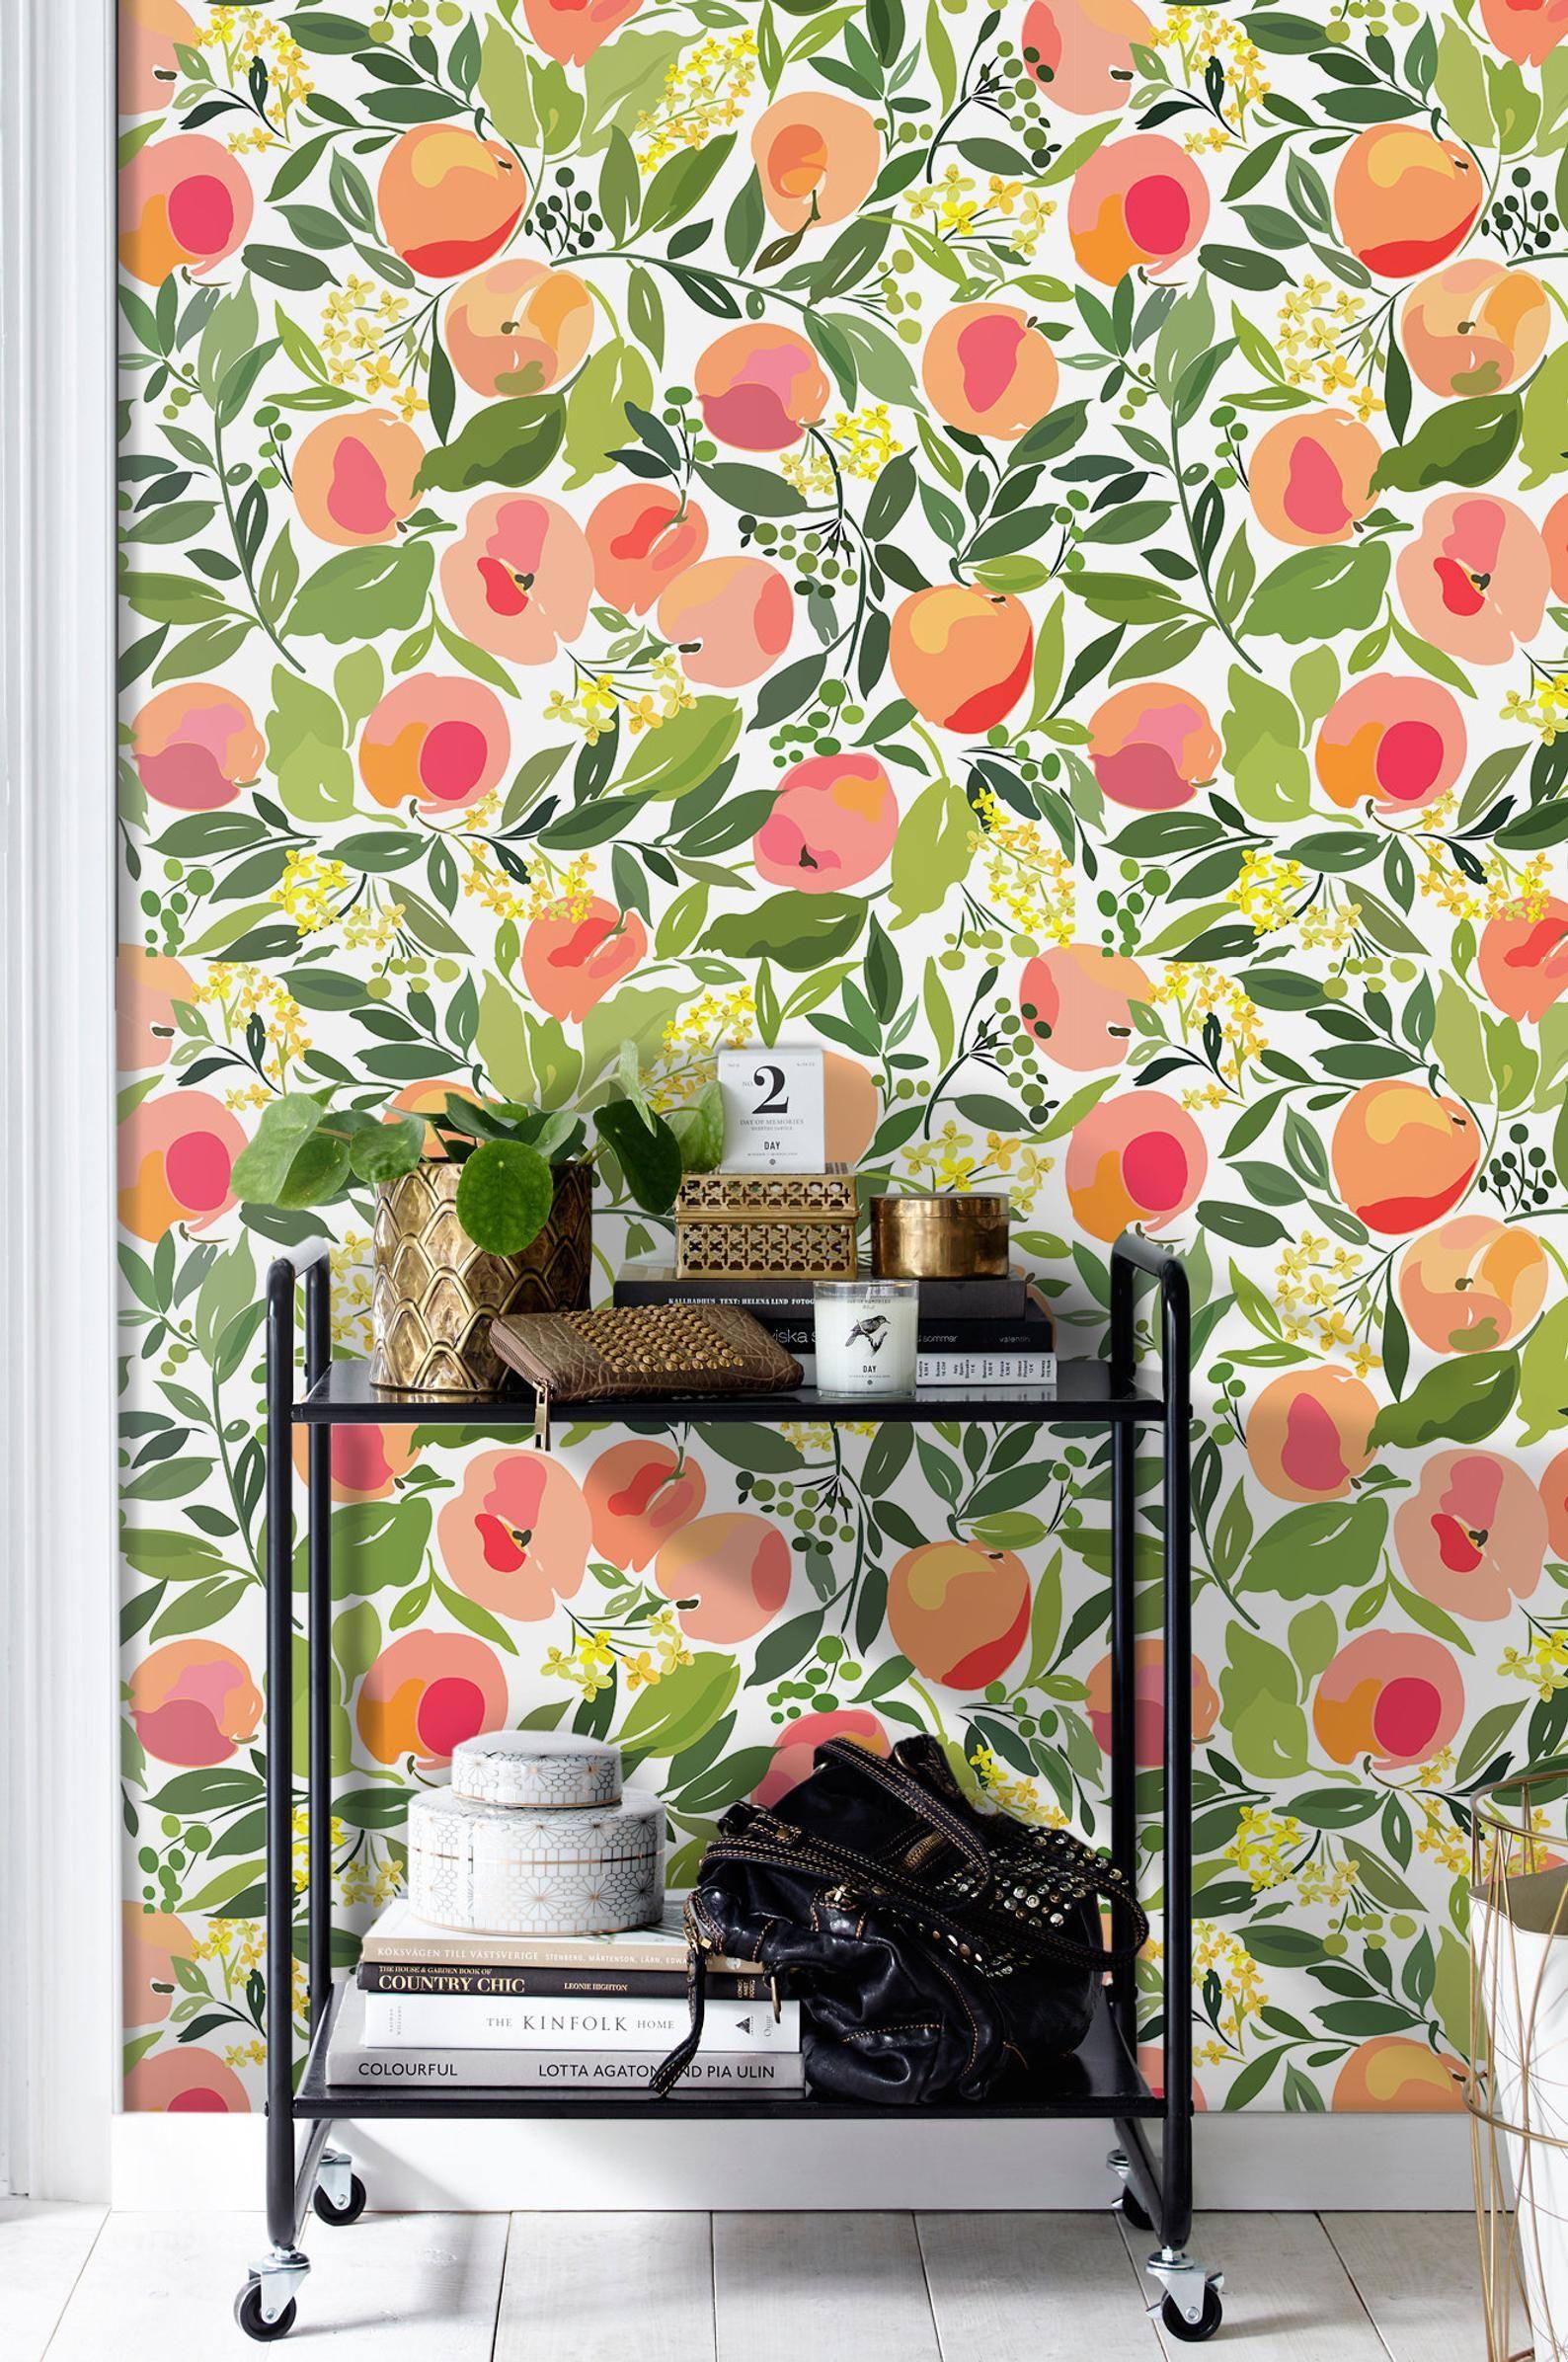 Peach Removable Wallpaper Green Wall Mural Reusable Etsy Removable Wallpaper Mural Green Wall